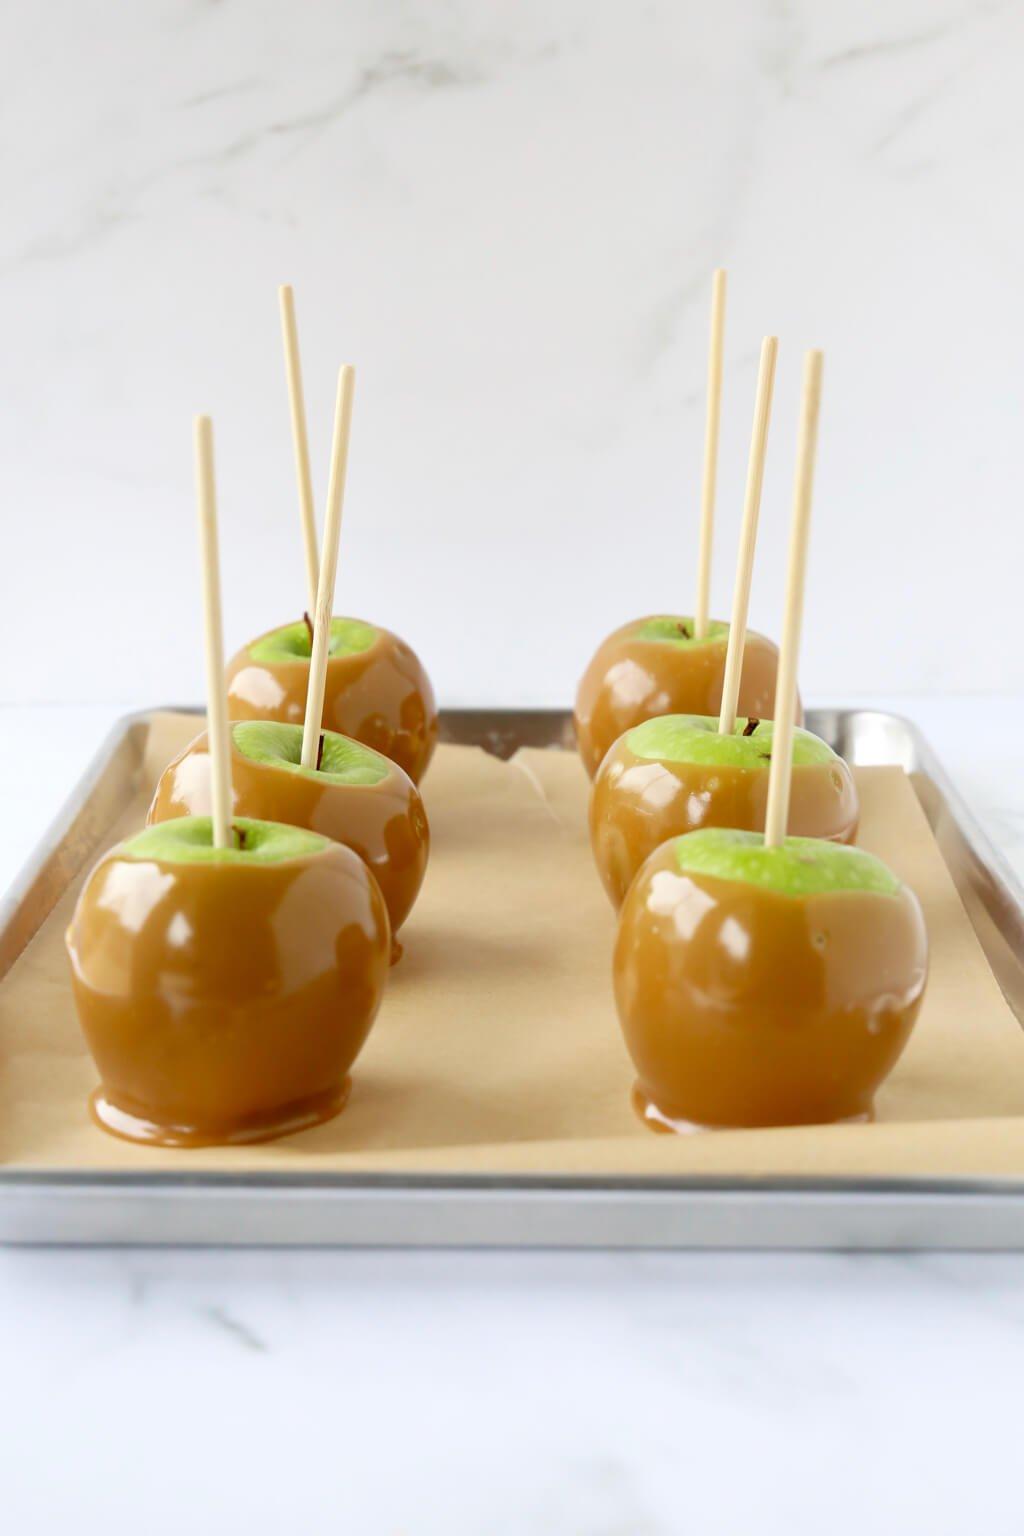 6 caramel apples sitting on a tray